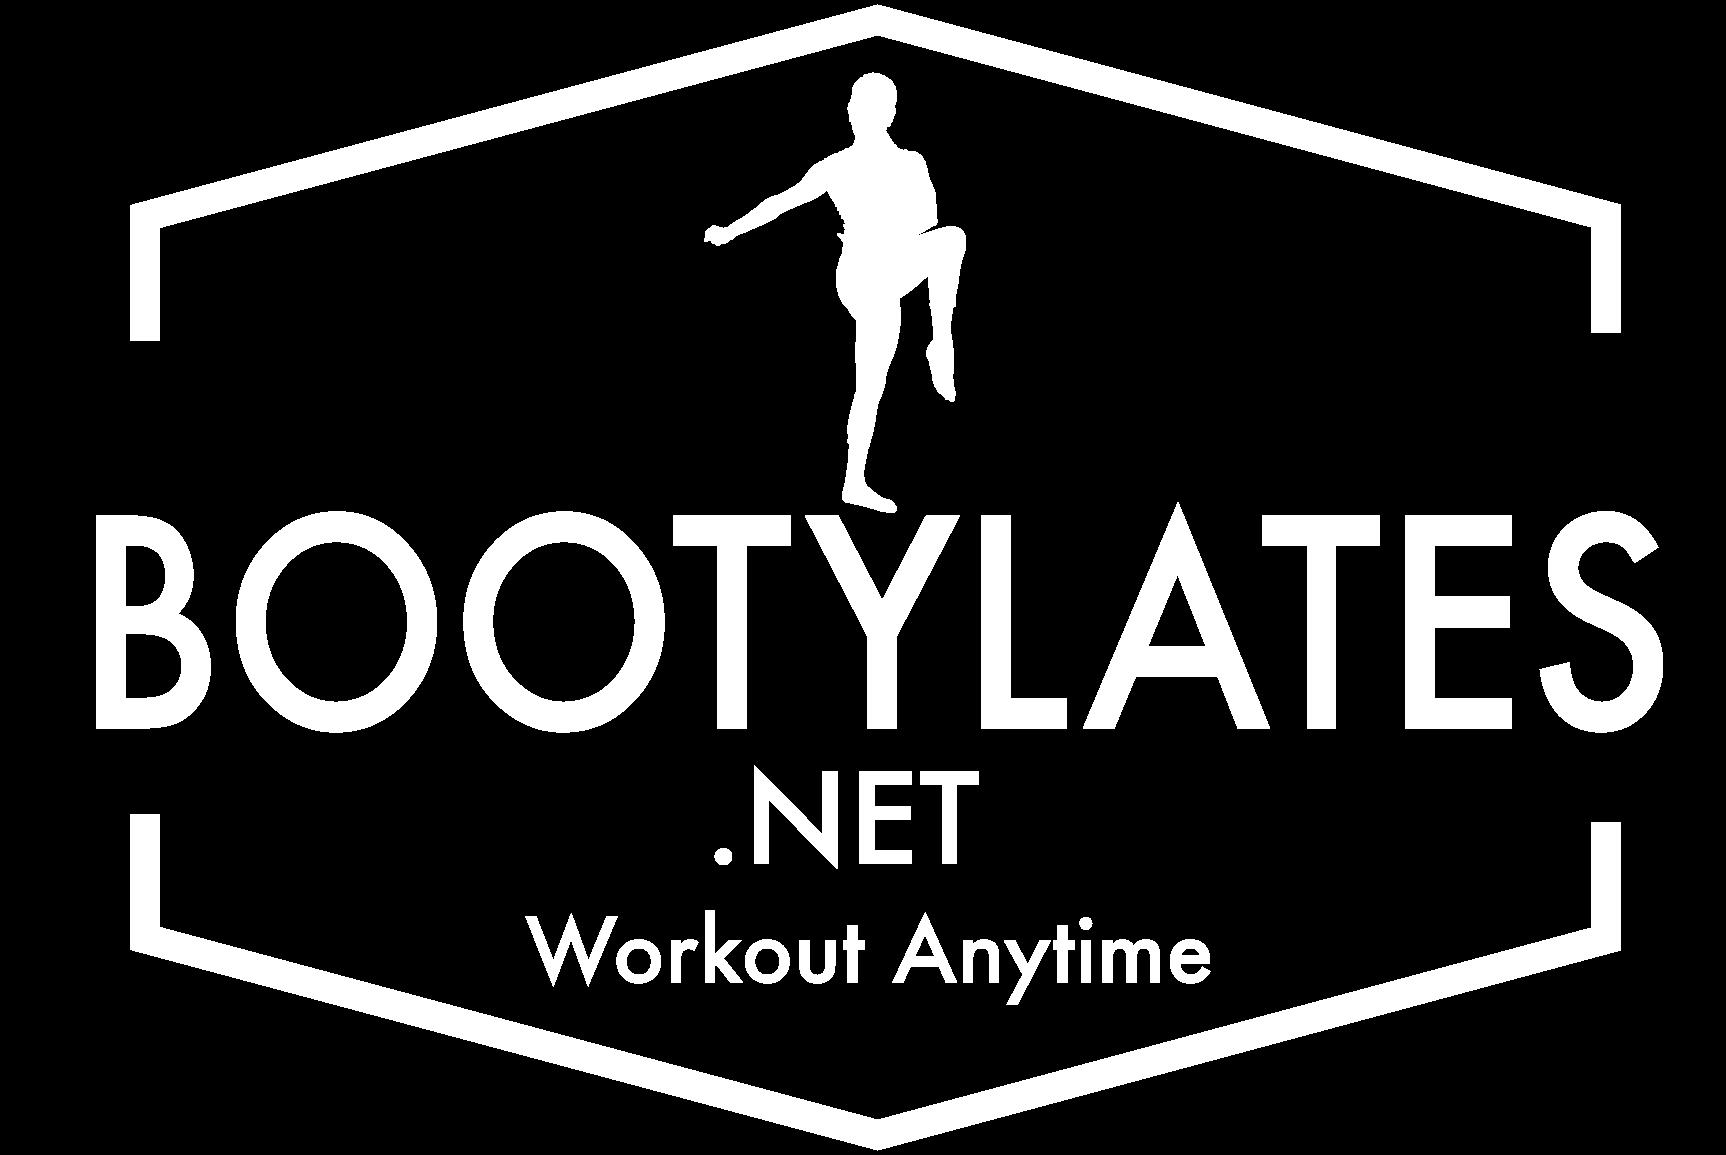 Bootylates On Demand Workout